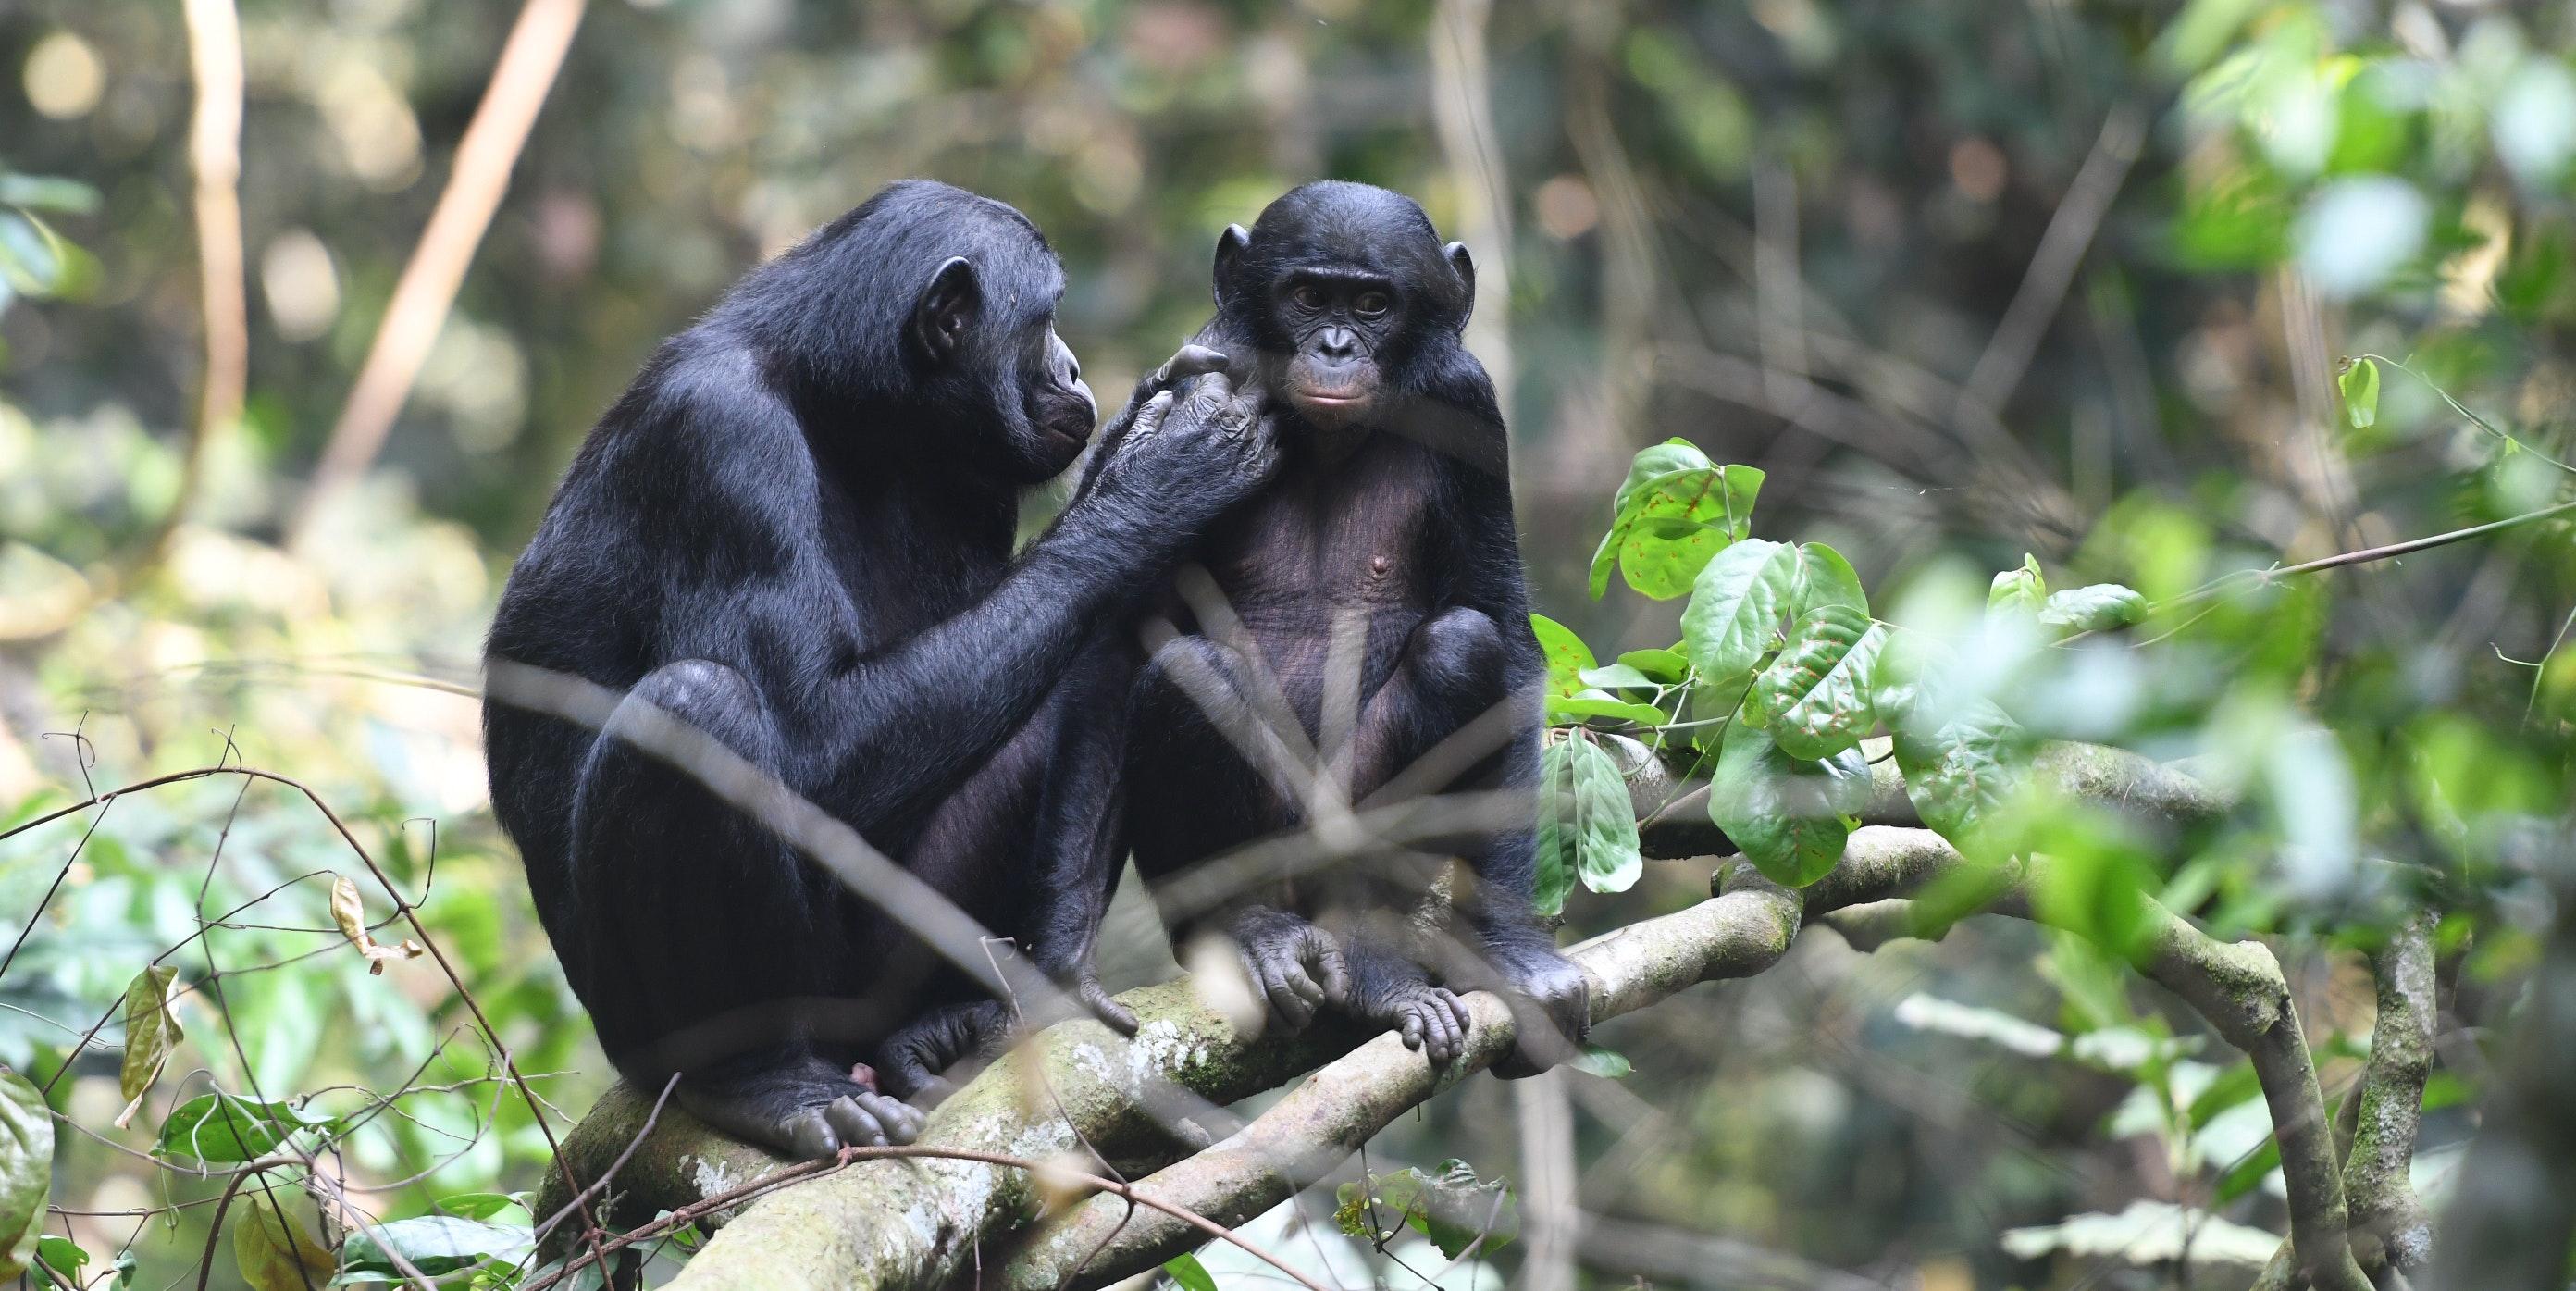 Moms of Other Species Pressure Their Kids Into Having Grandchildren, Too